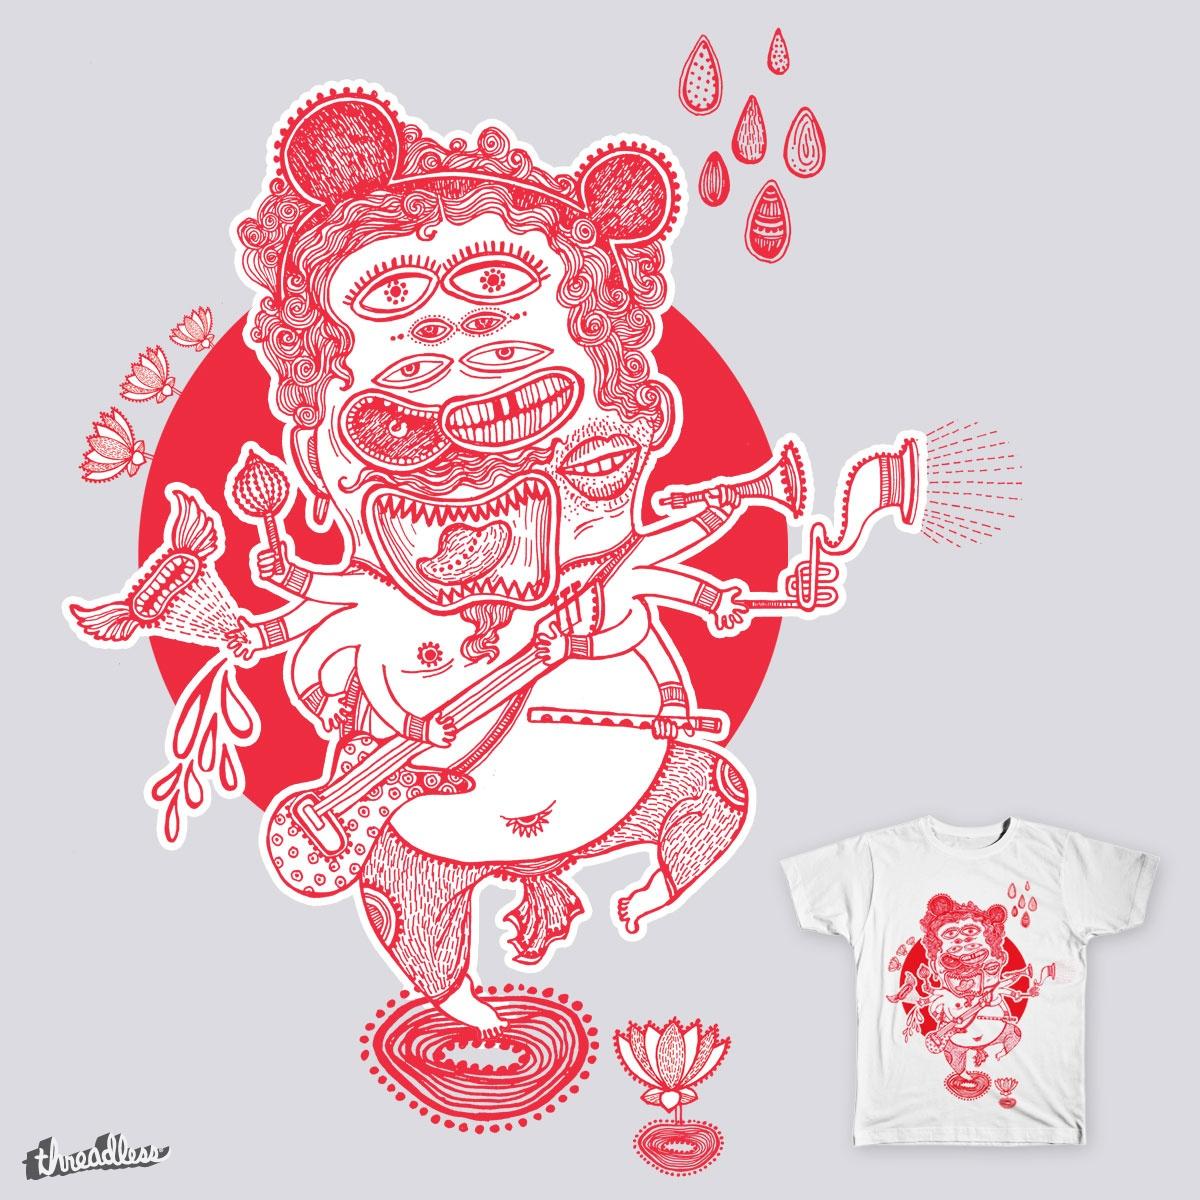 Rockin' God by ajinkya on Threadless